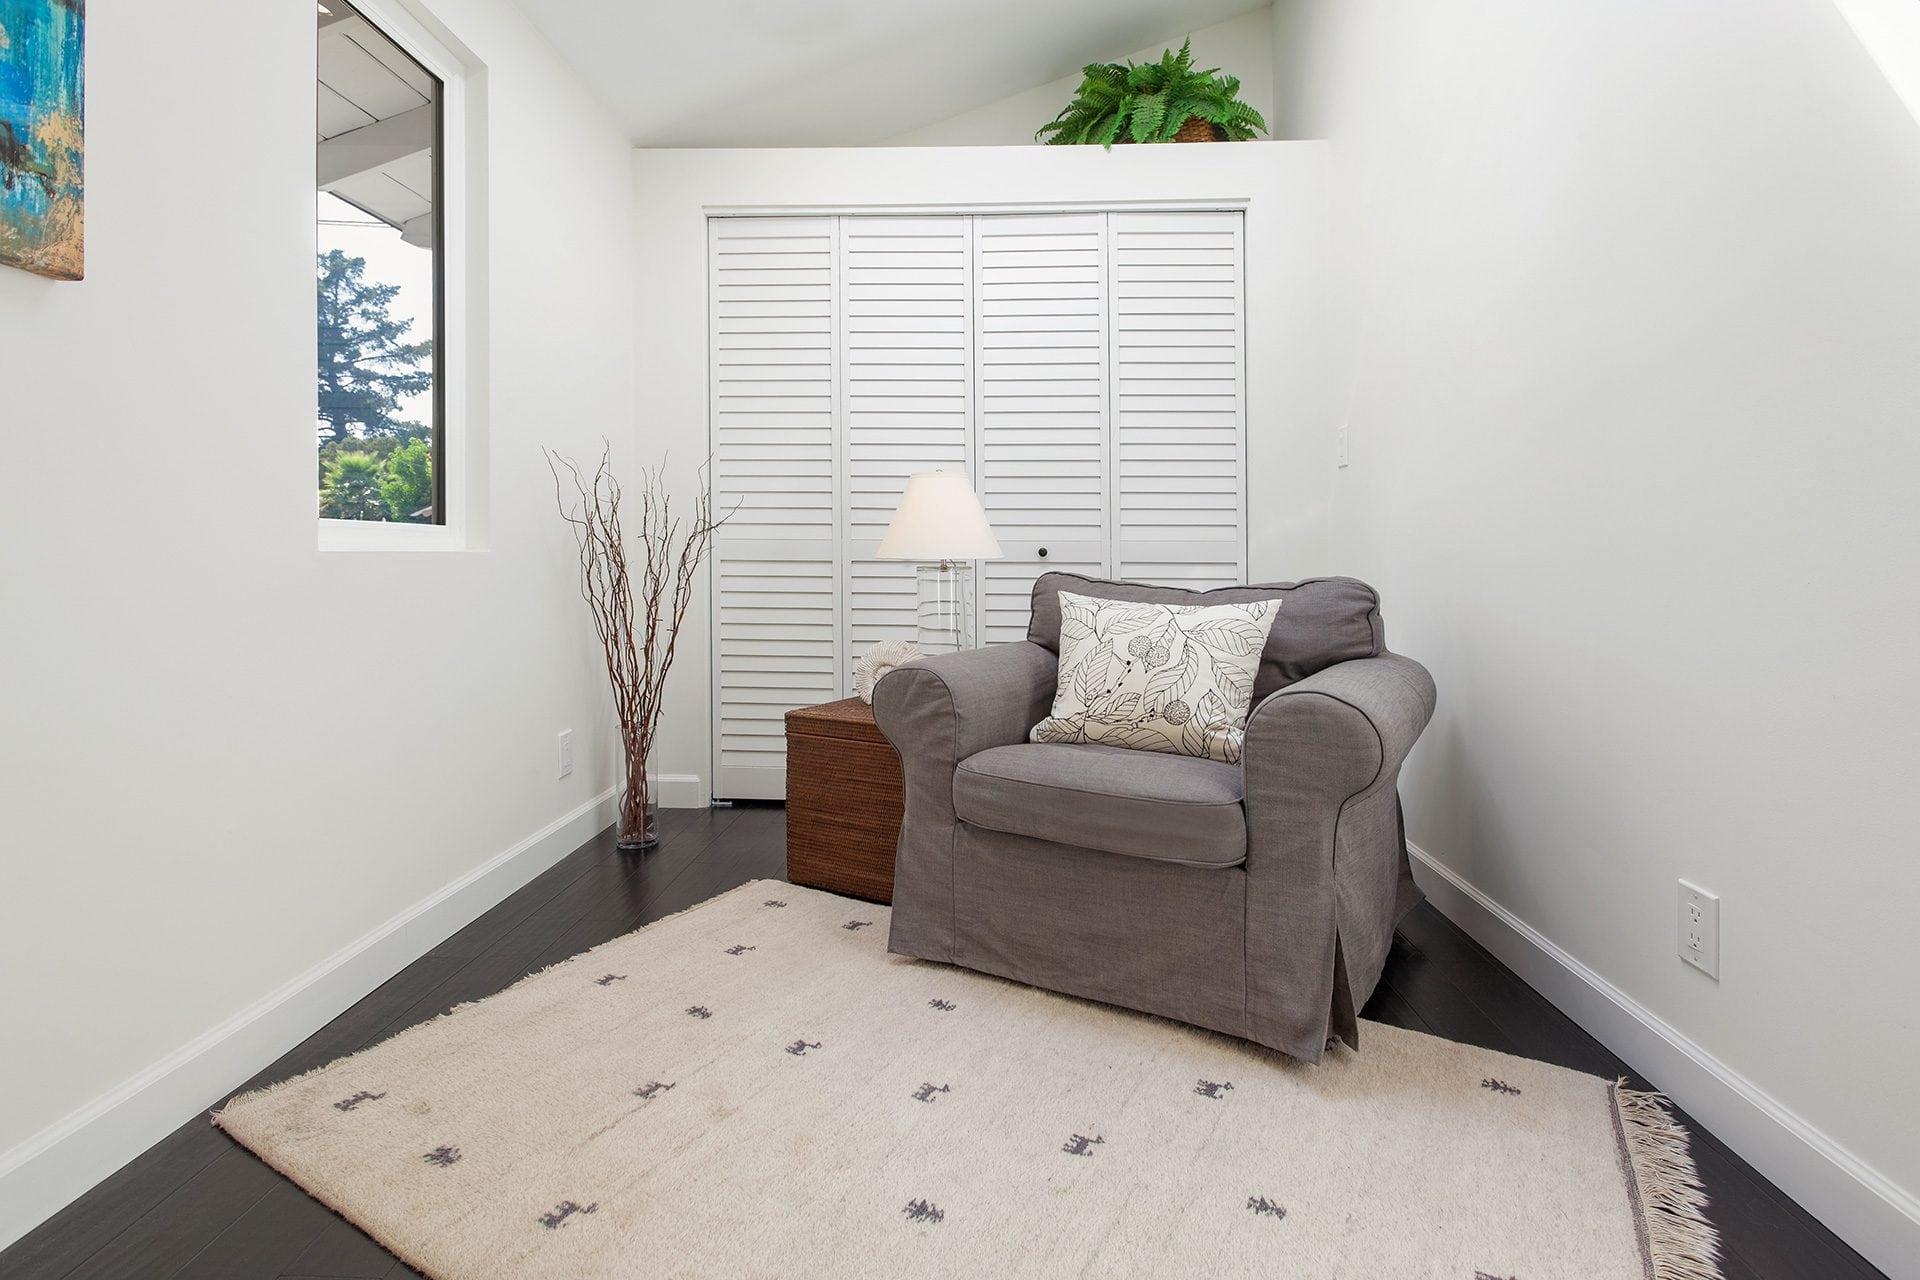 grey comfy chair